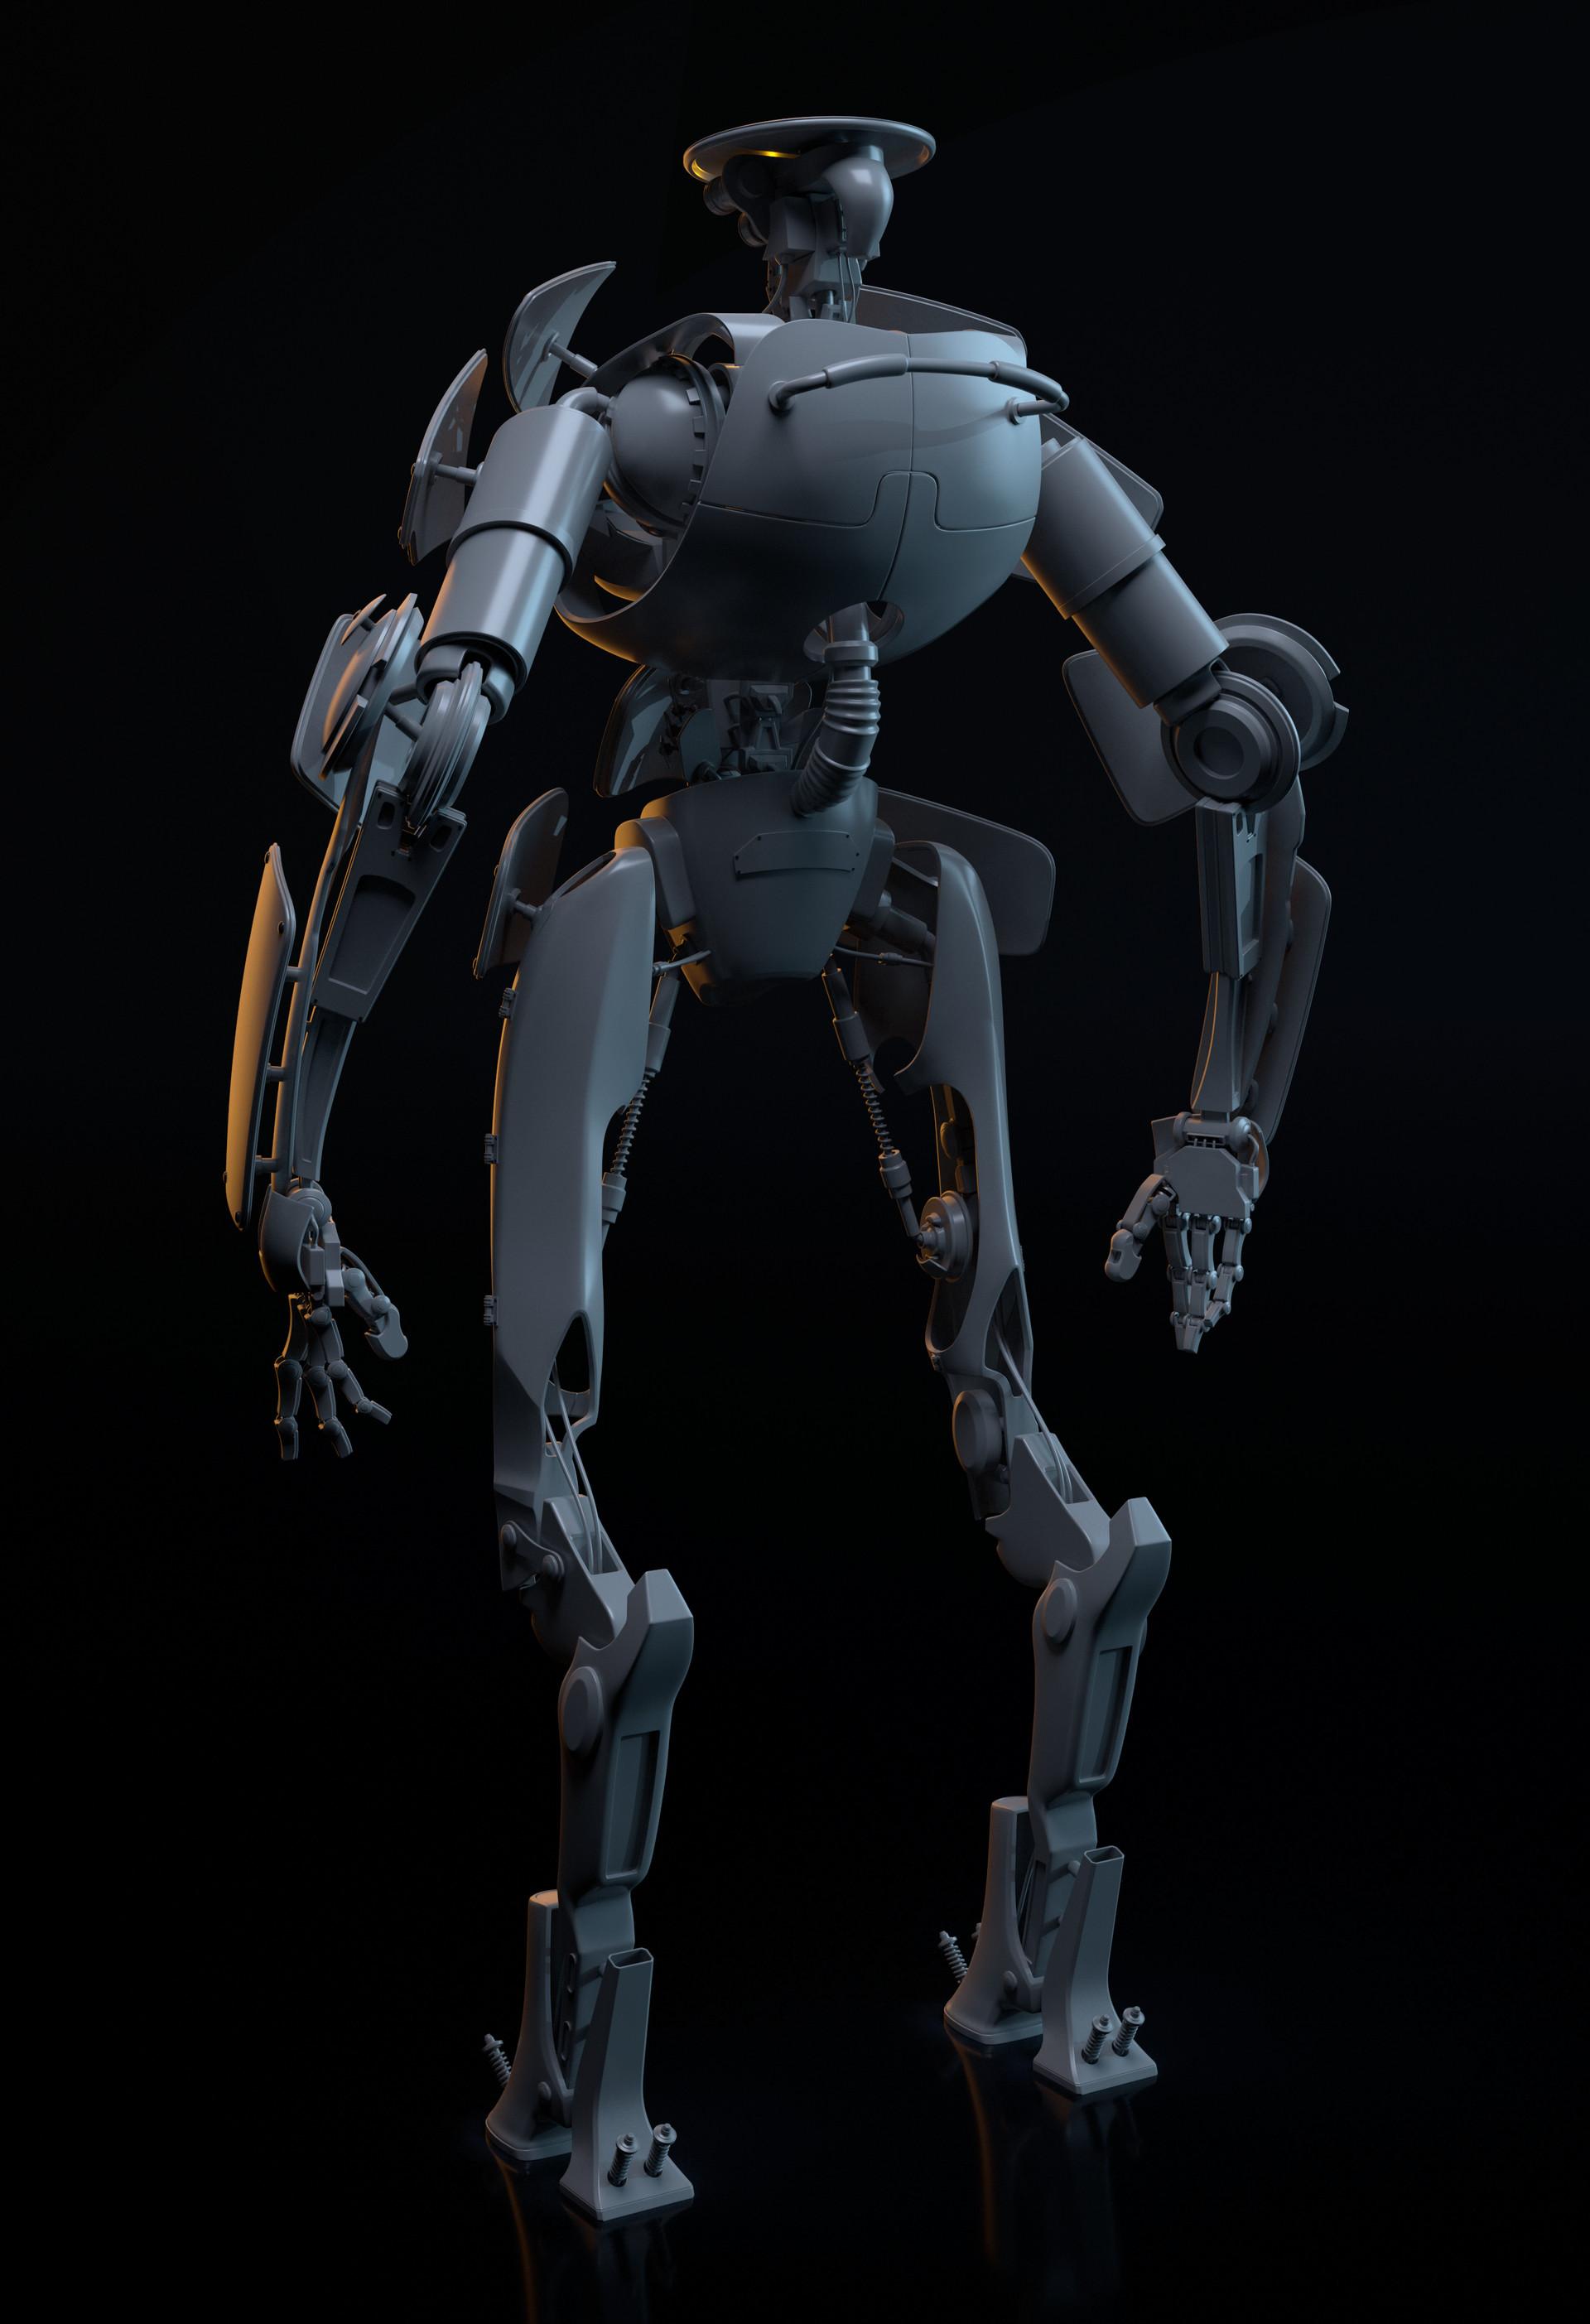 Alec hunstx robot backadj